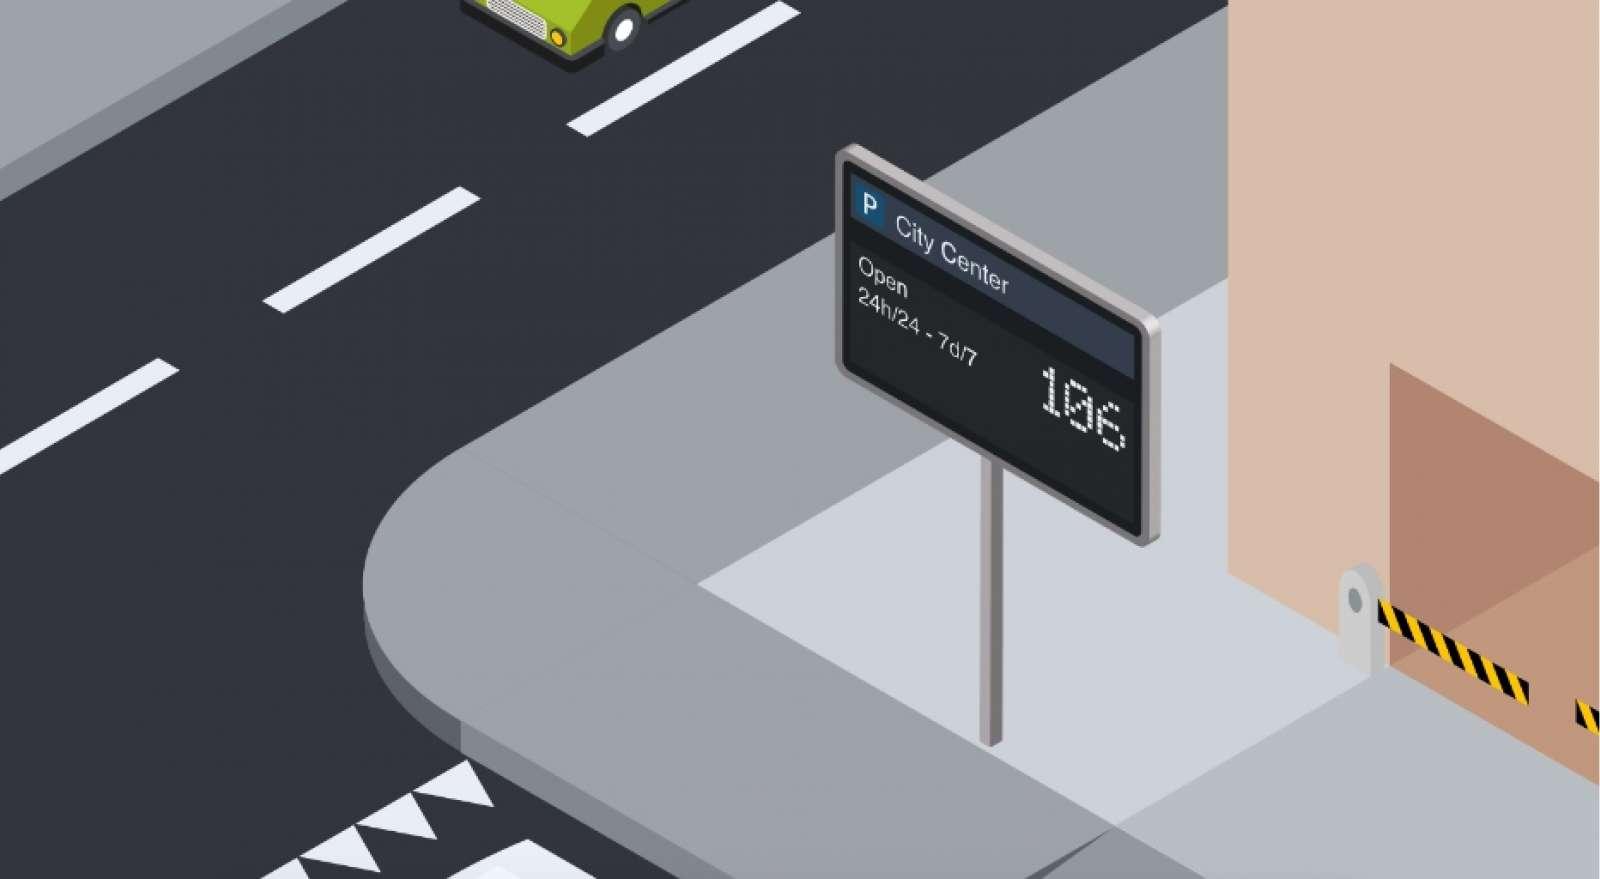 Traffic parking guidance 2